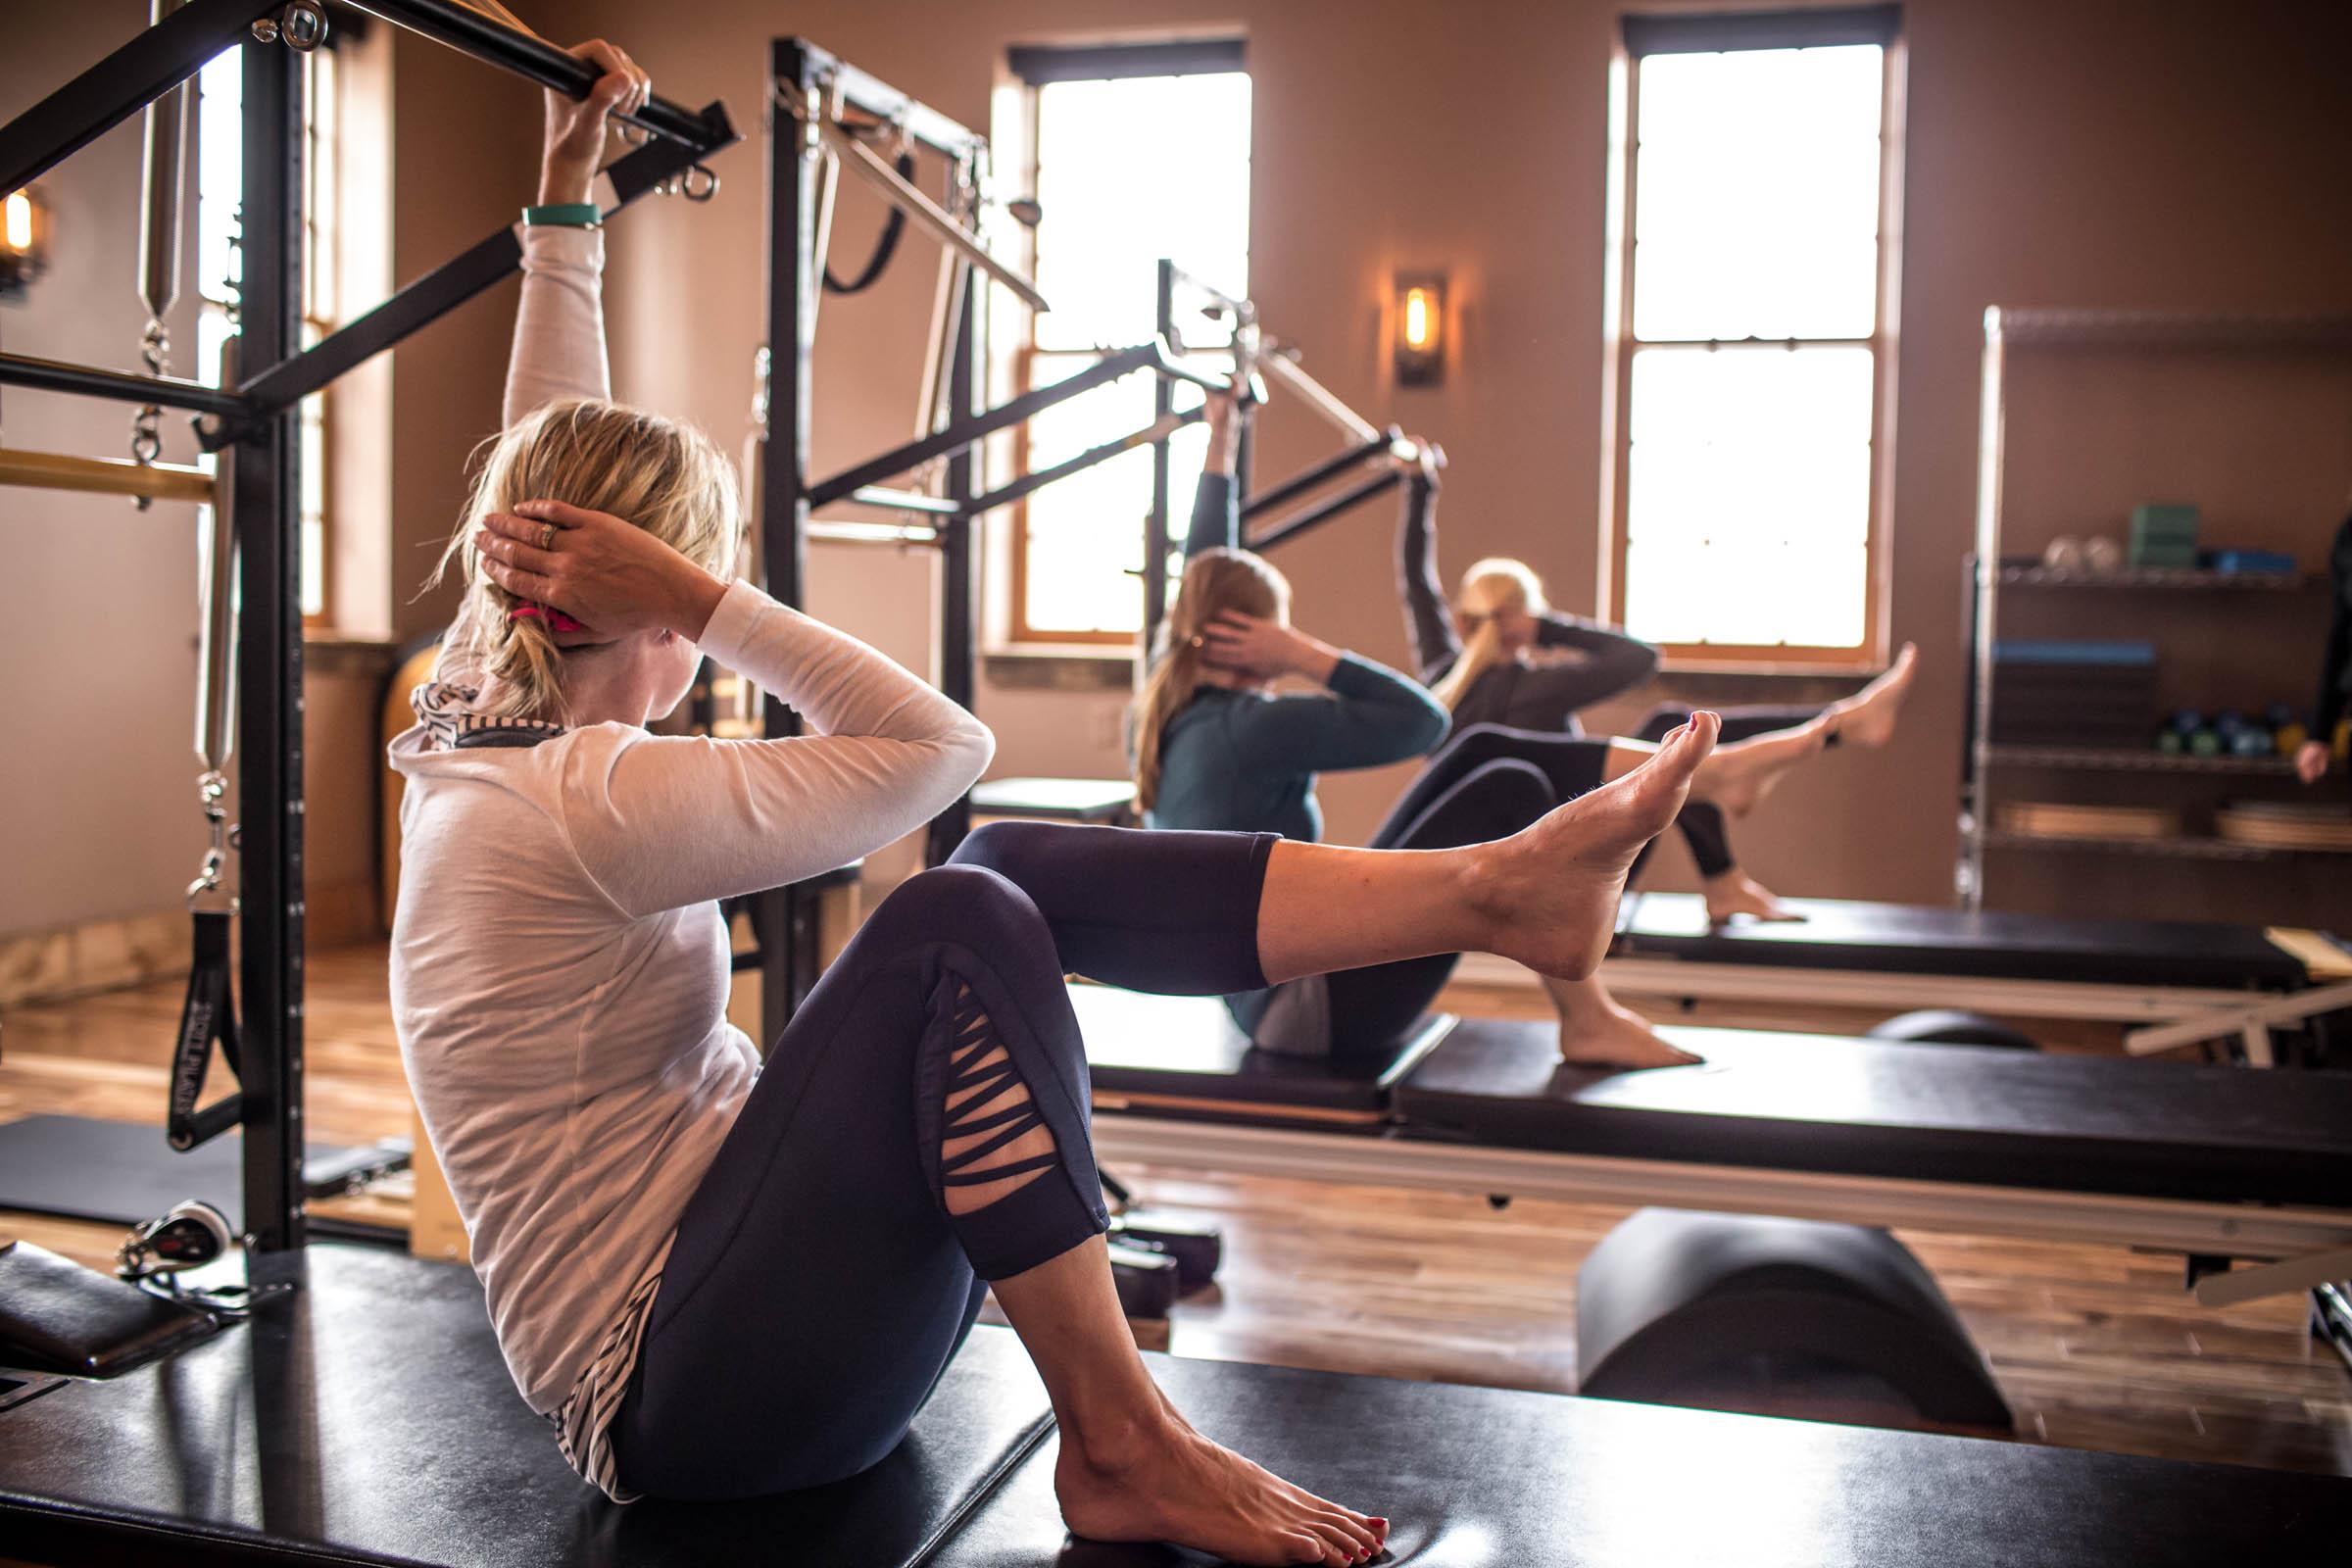 be_fitness_instructors_delafield_0225.jpg